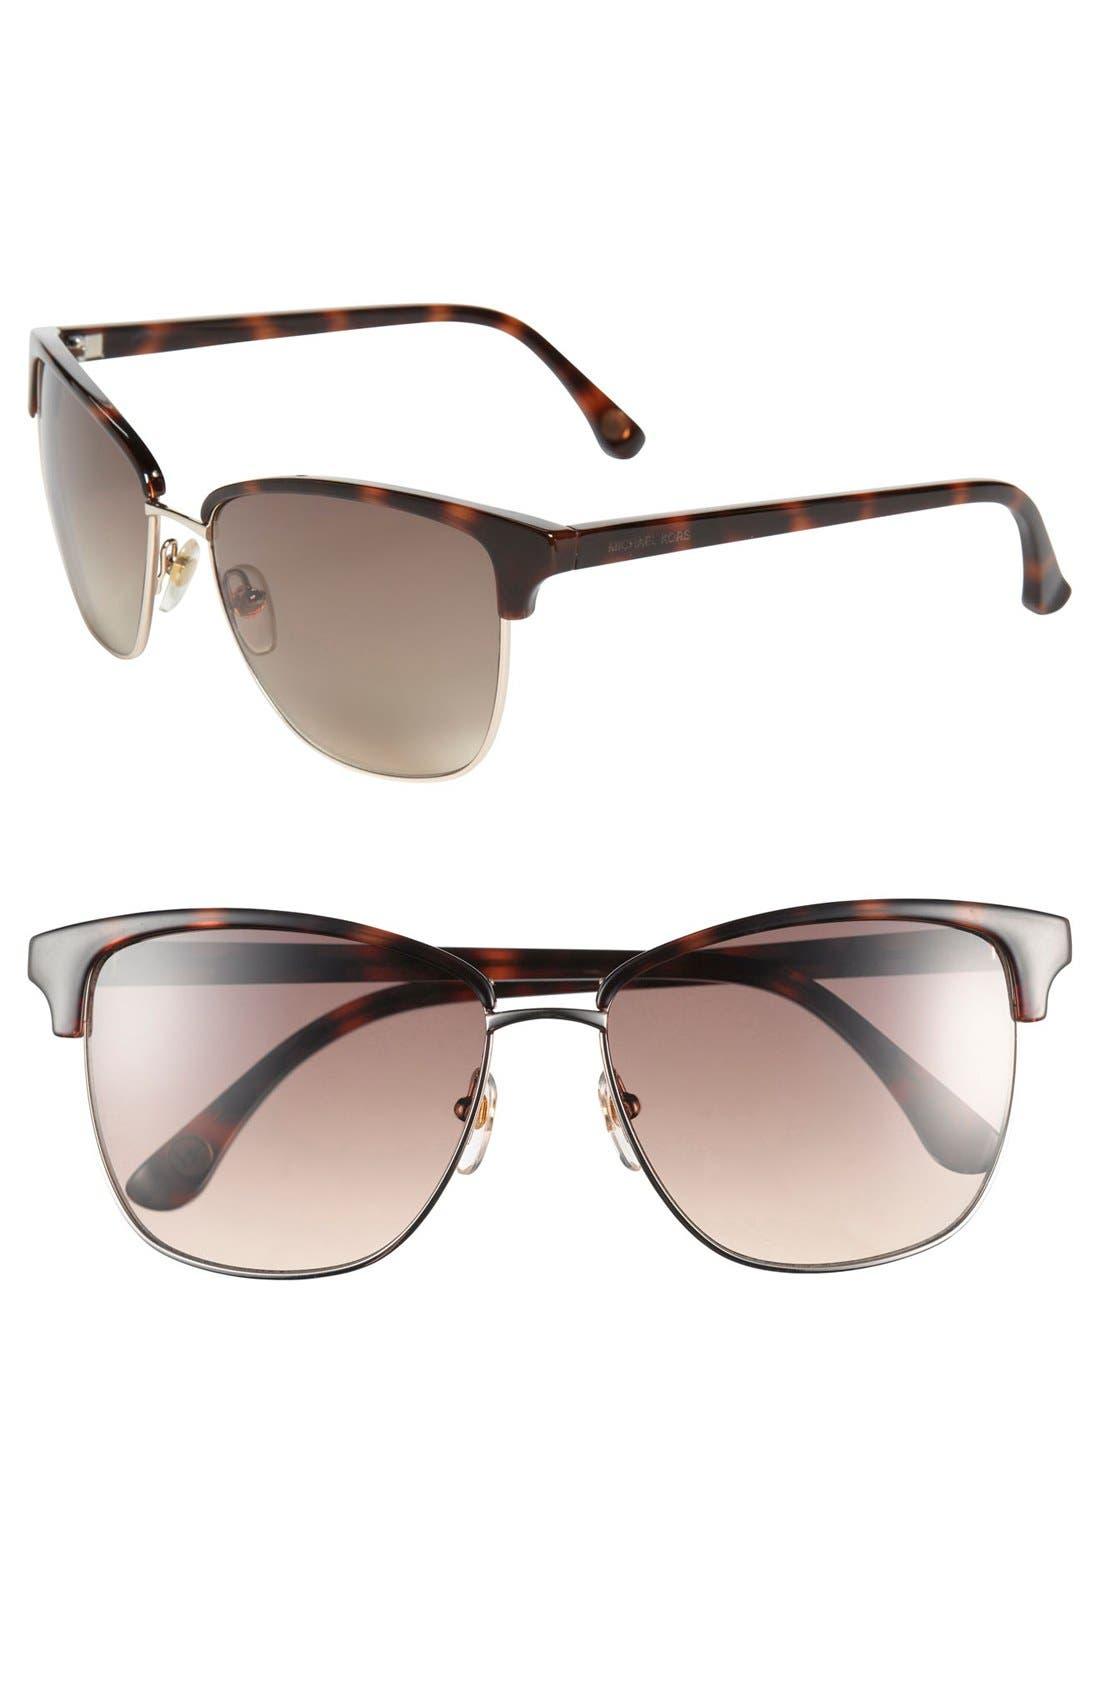 Main Image - MICHAEL Michael Kors 'Ruth' 57mm Retro Sunglasses